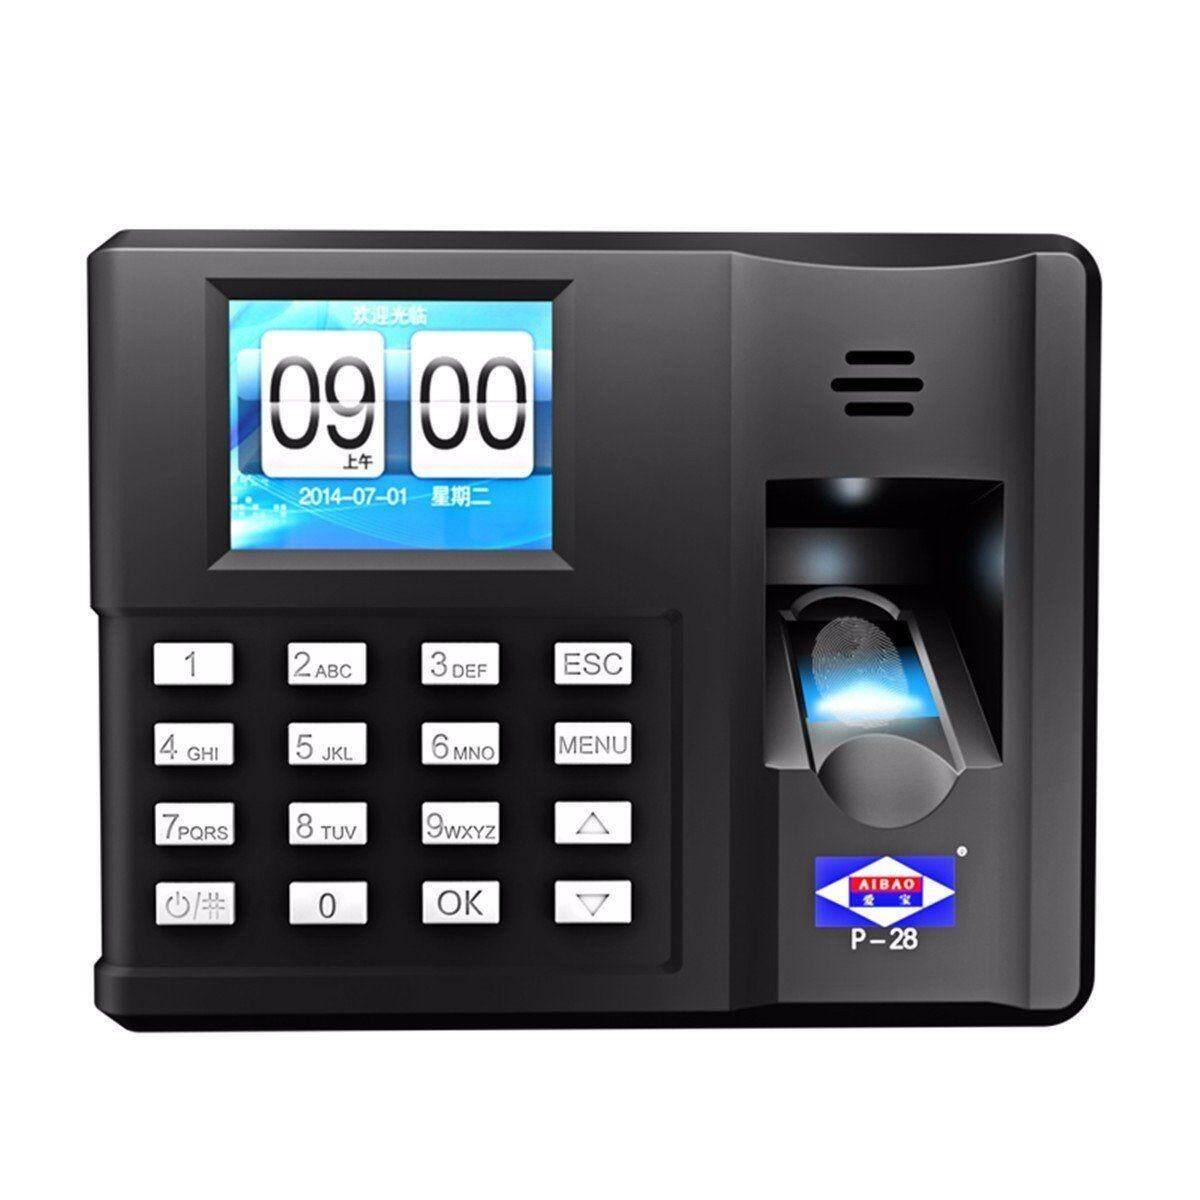 Colour Display ( 15 years warranty ) Fingerprint Time Attendance Clock Recorder